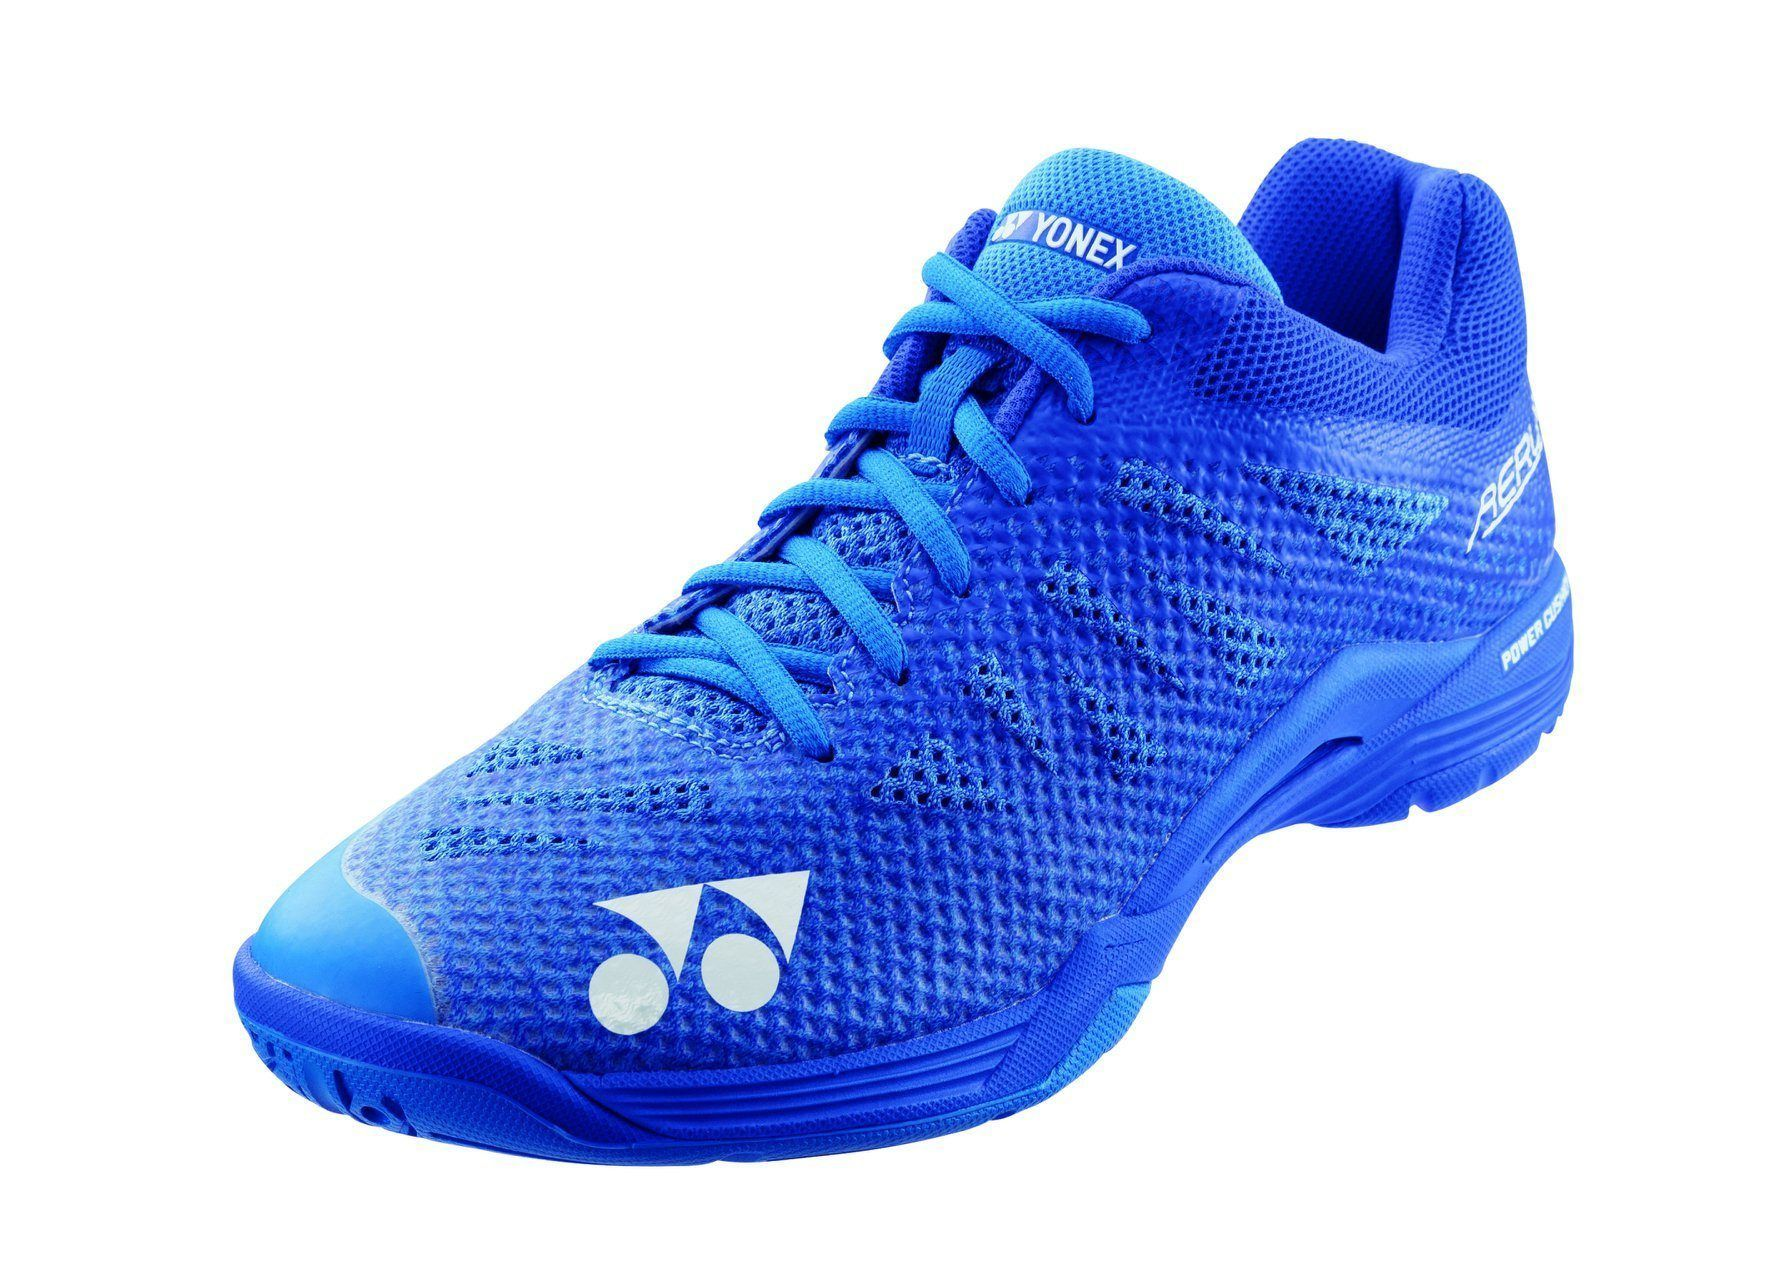 Yonex Aerus 3 MX Men's Badminton Shoe